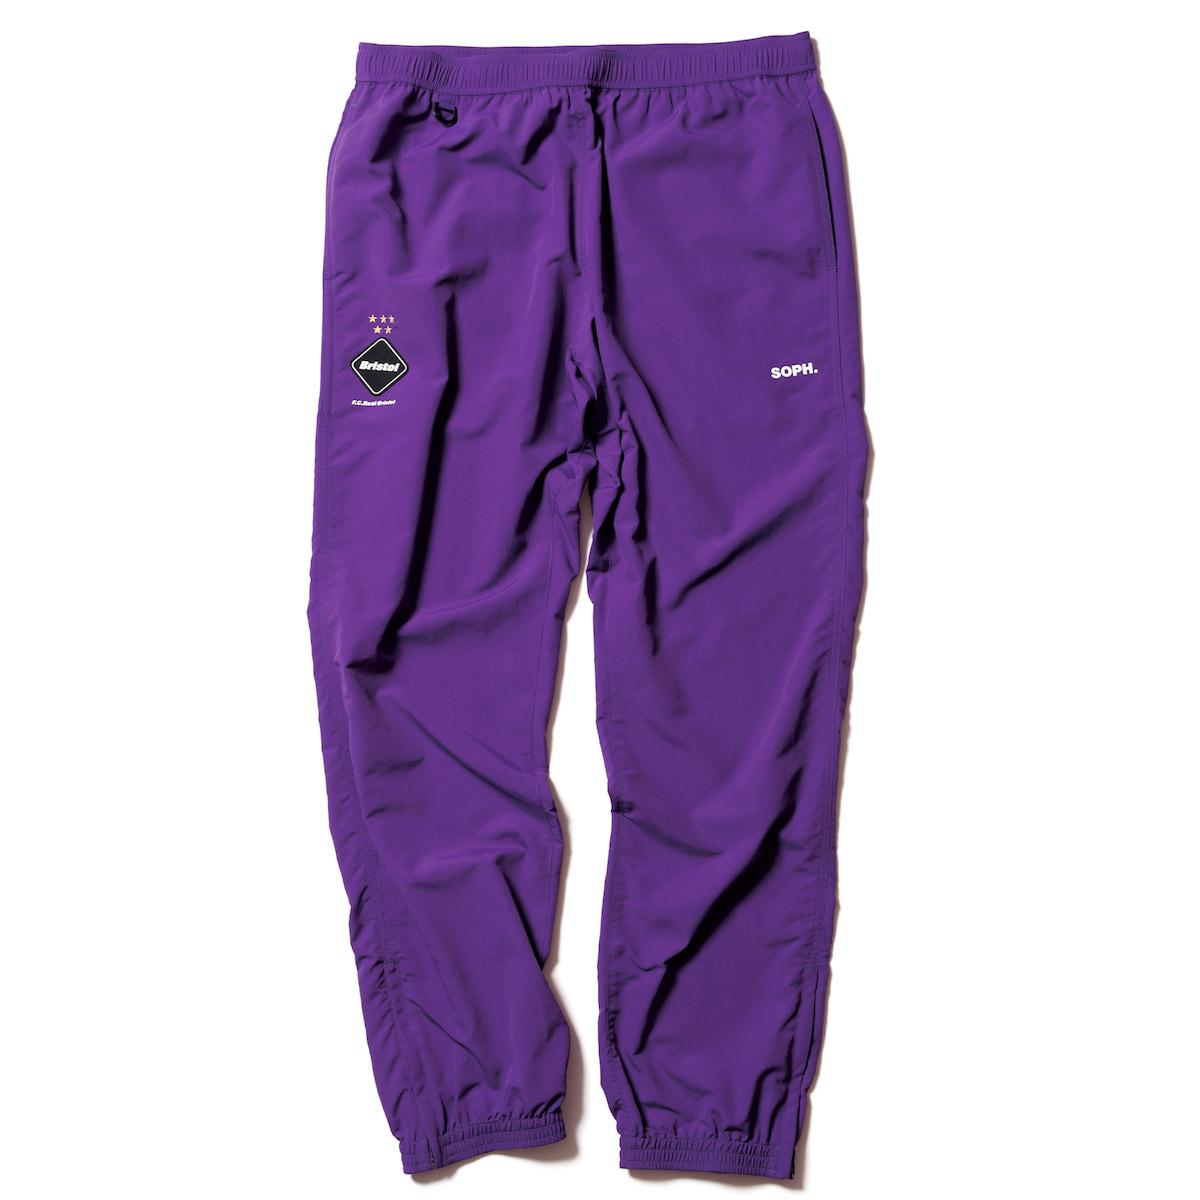 F.C.Real Bristol / NYLON EASY LONG PANTS (Purple)